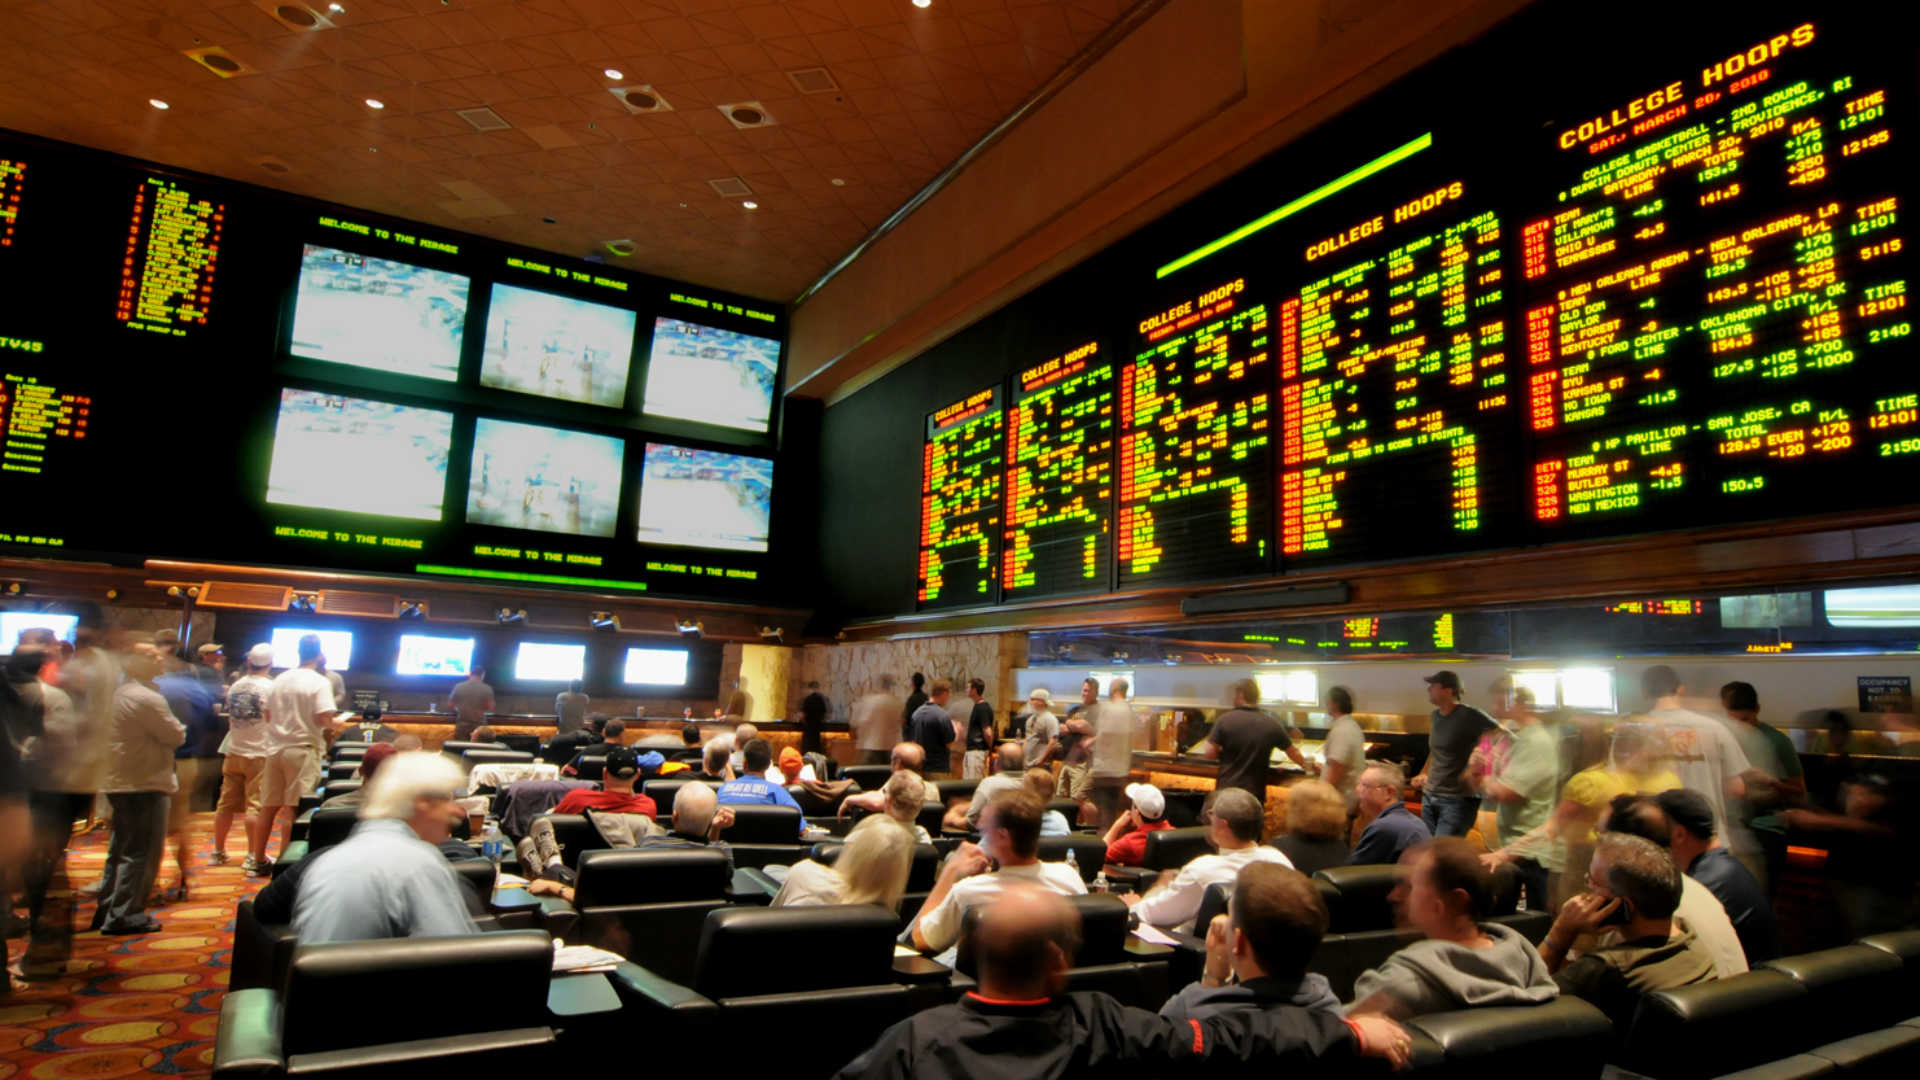 The NCAA Tournament draws fans to a Las Vegas casino.